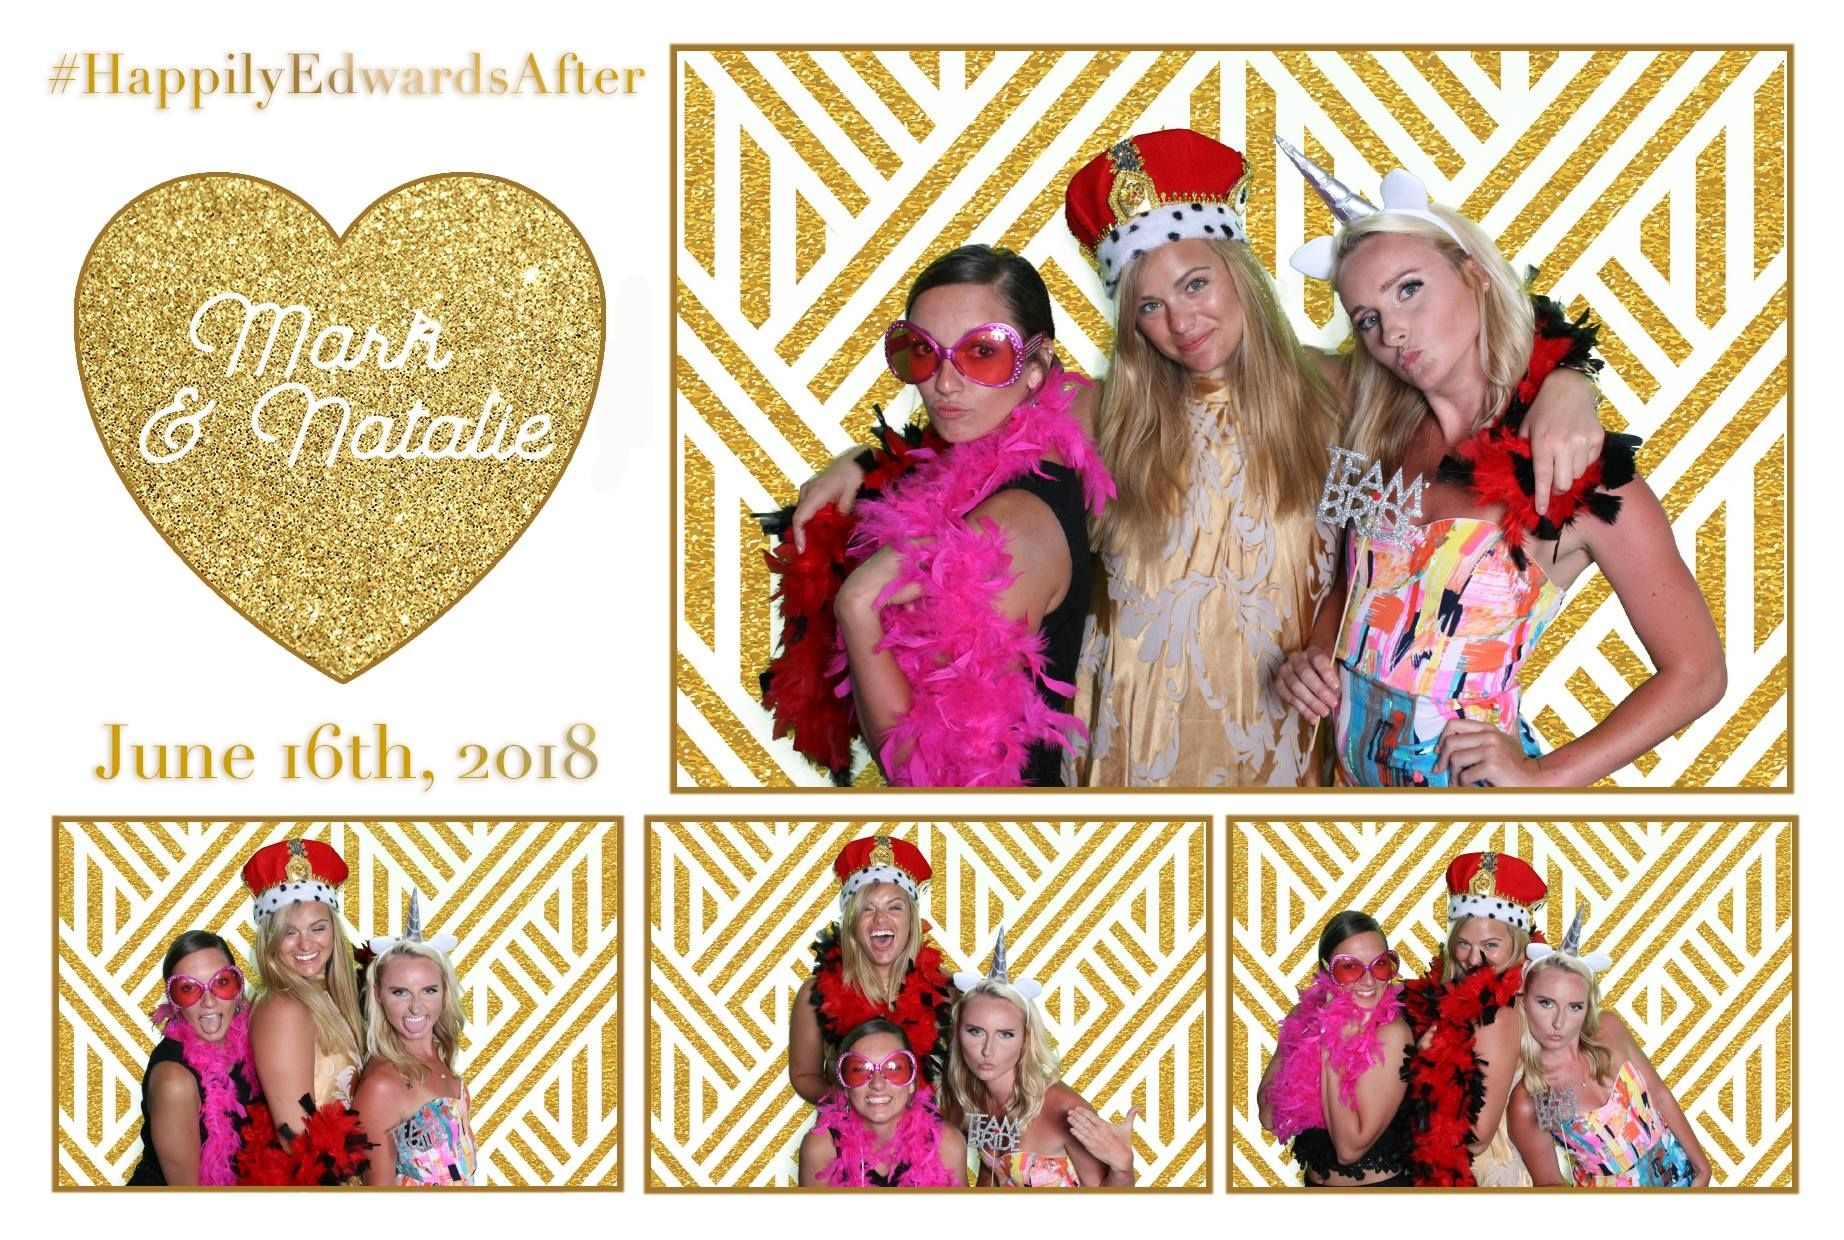 Wedding, Wedding Photo Booth, Photo Booth, Selfie Booth